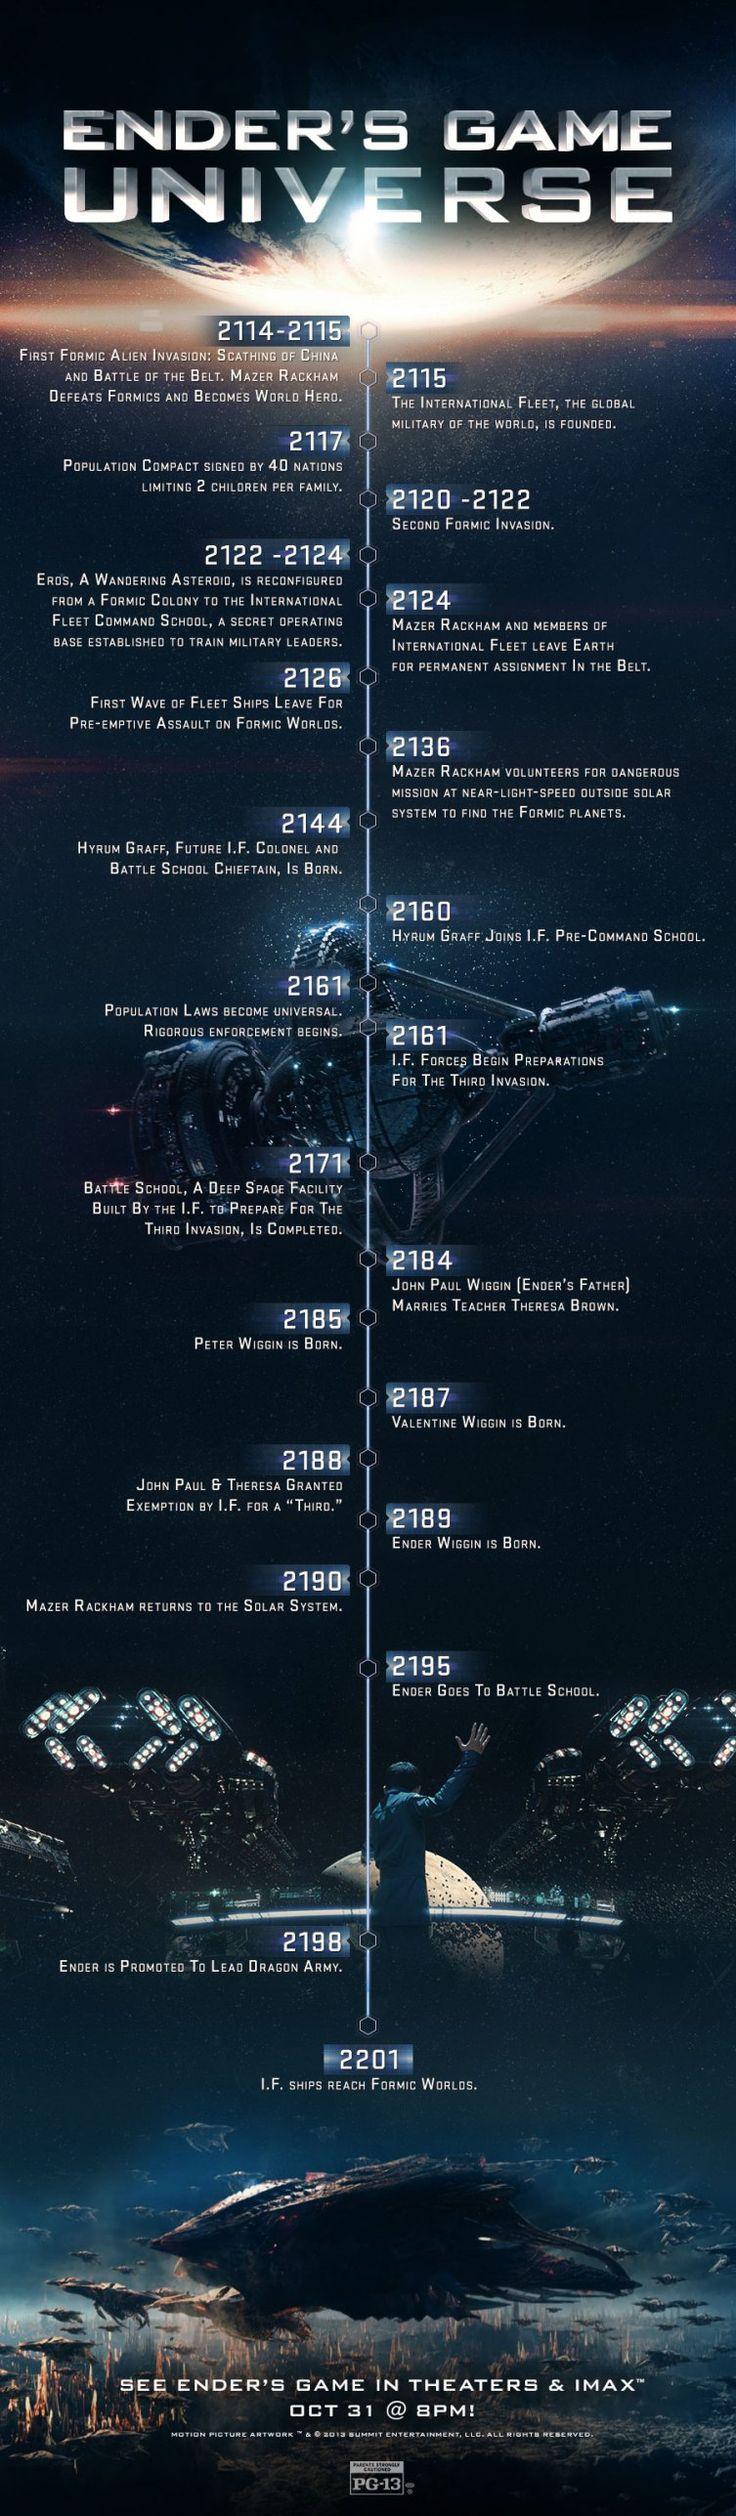 Ender's Game Chronology Infographic